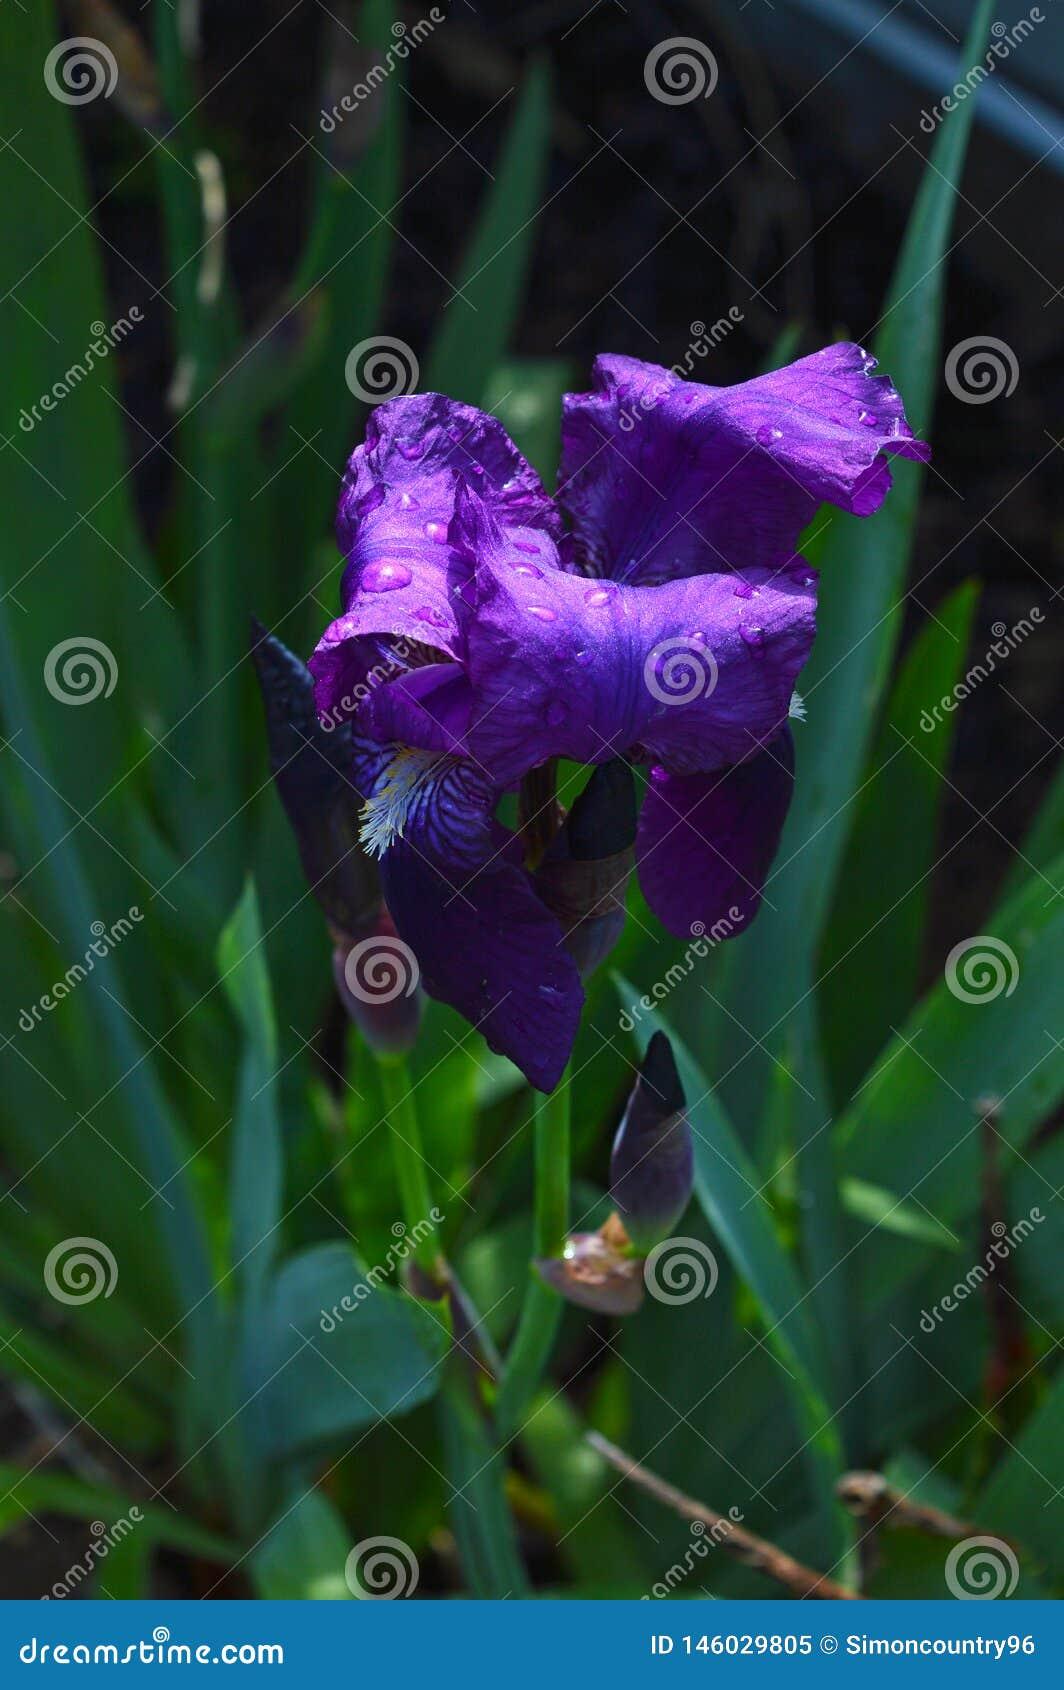 Close-up of a Purple Iris in Bloom, Nature, Macro